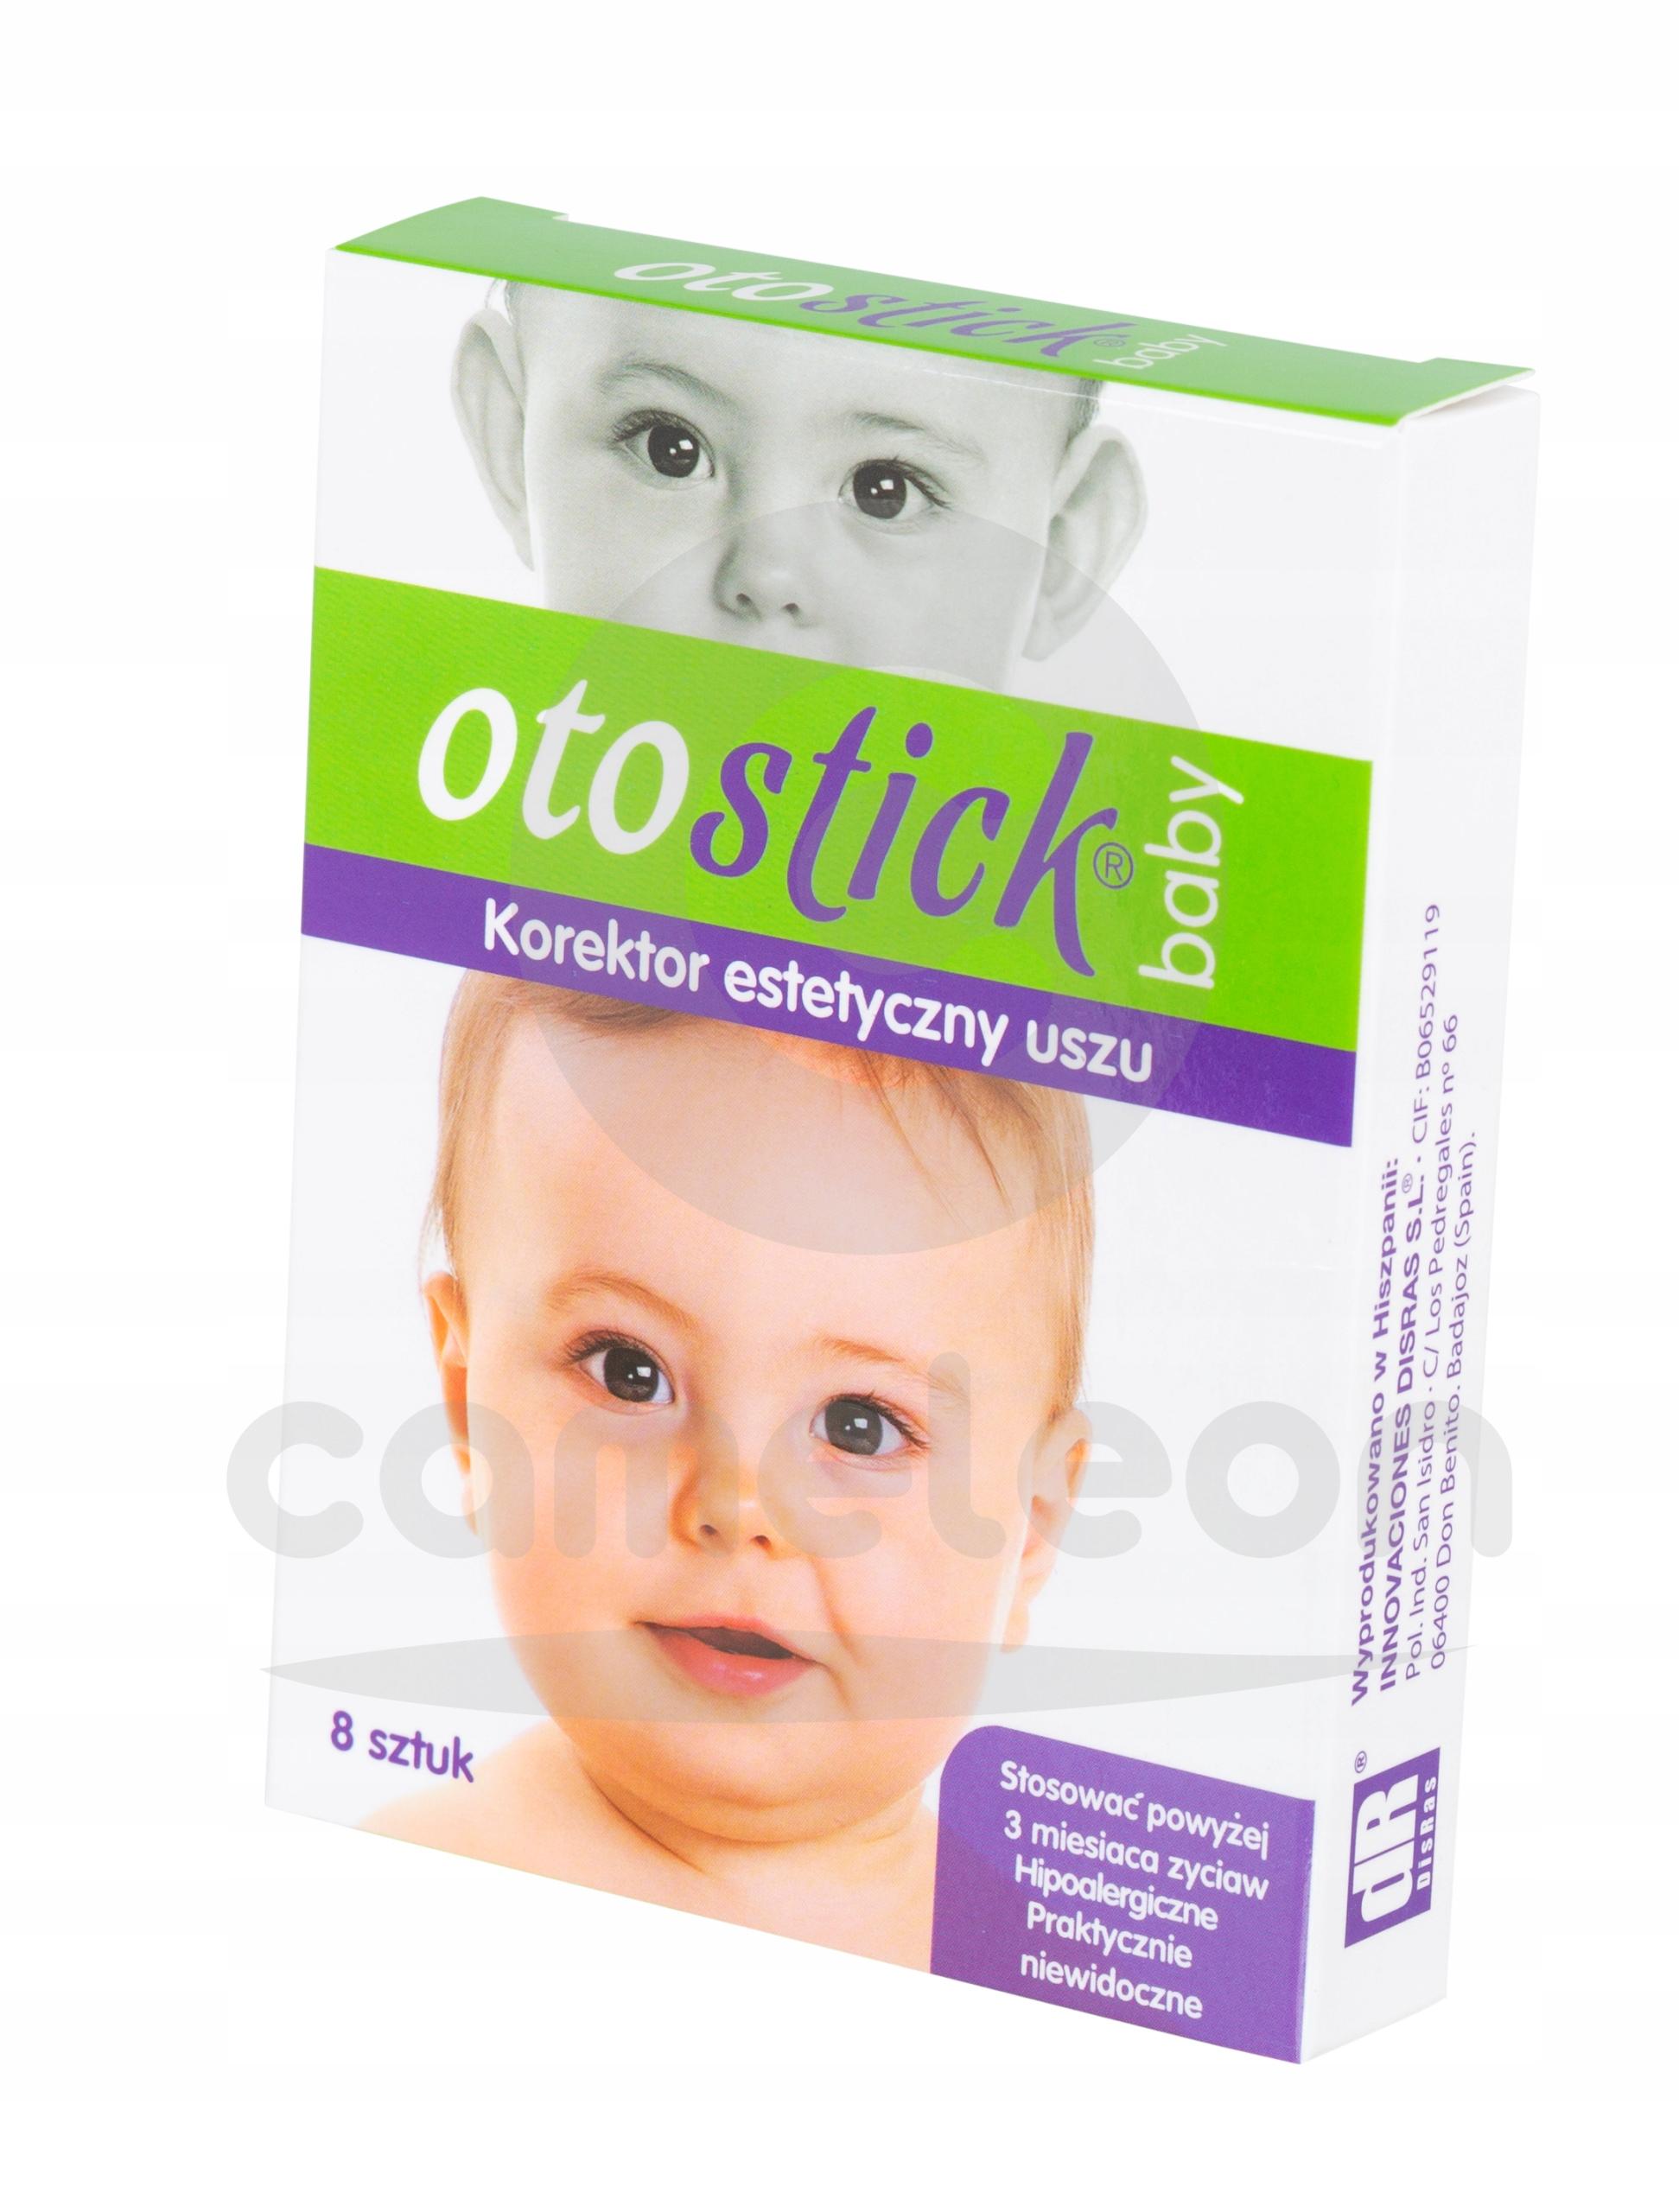 OTOPTICKÉ BABY AESTHETICKÉ KONTROLA PRE DETI